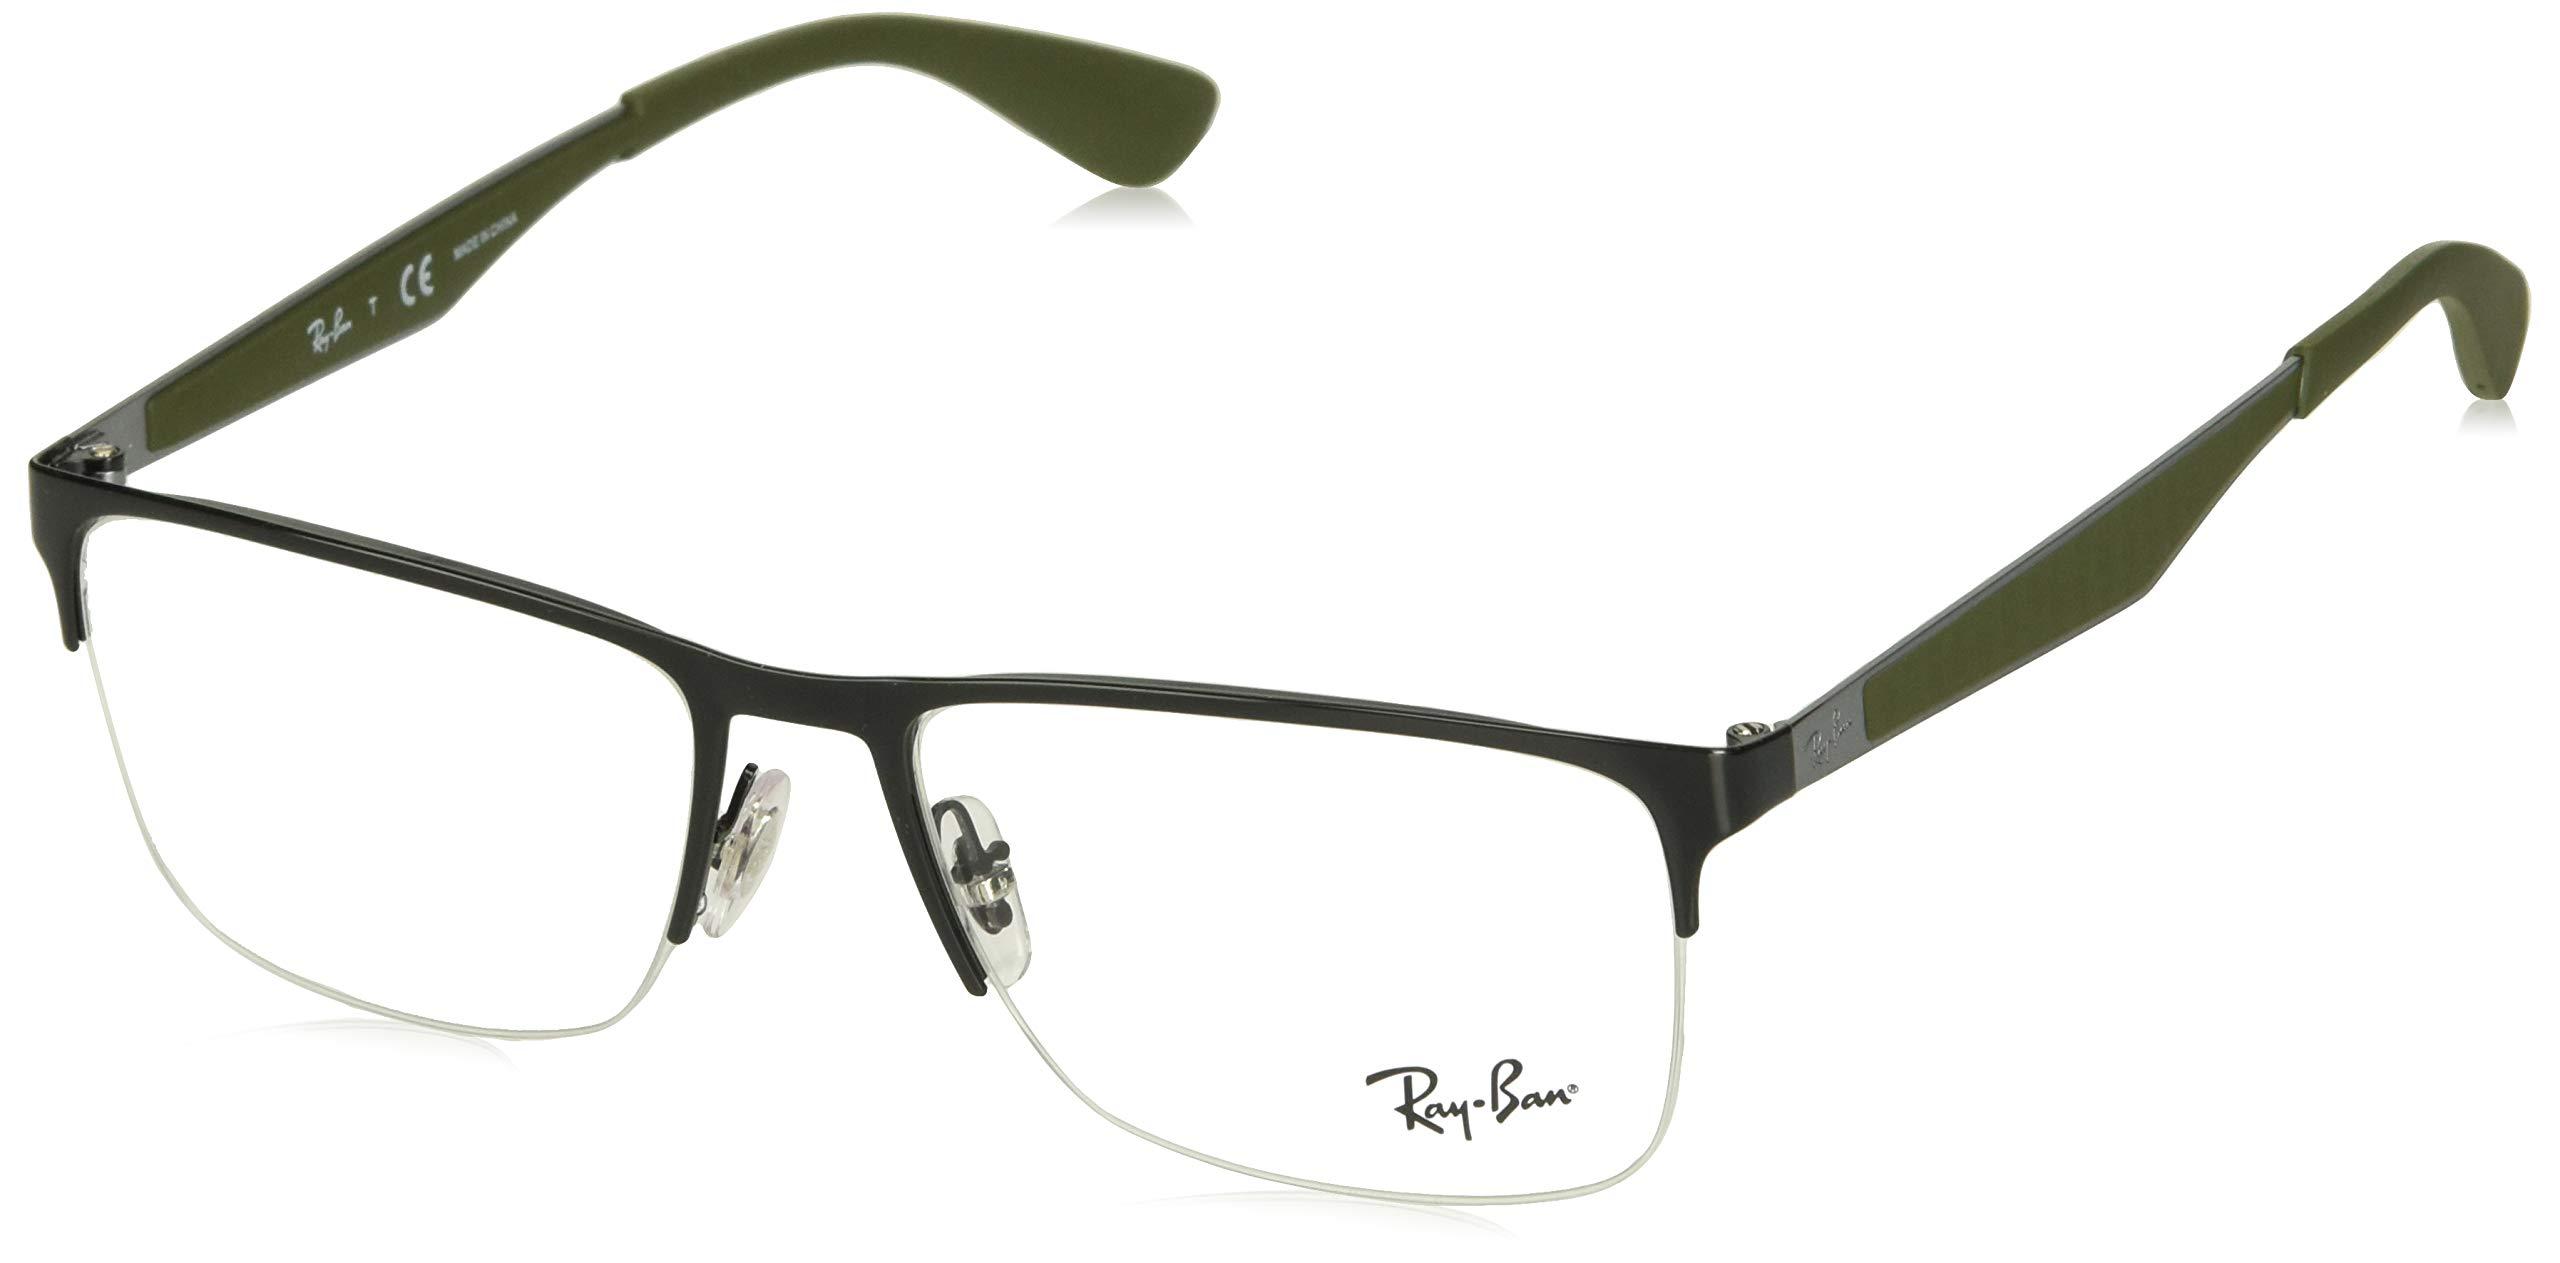 RAY-BAN RX6335 Rectangular Metal Eyeglass Frames, Black/Demo Lens, 54 mm by Ray-Ban